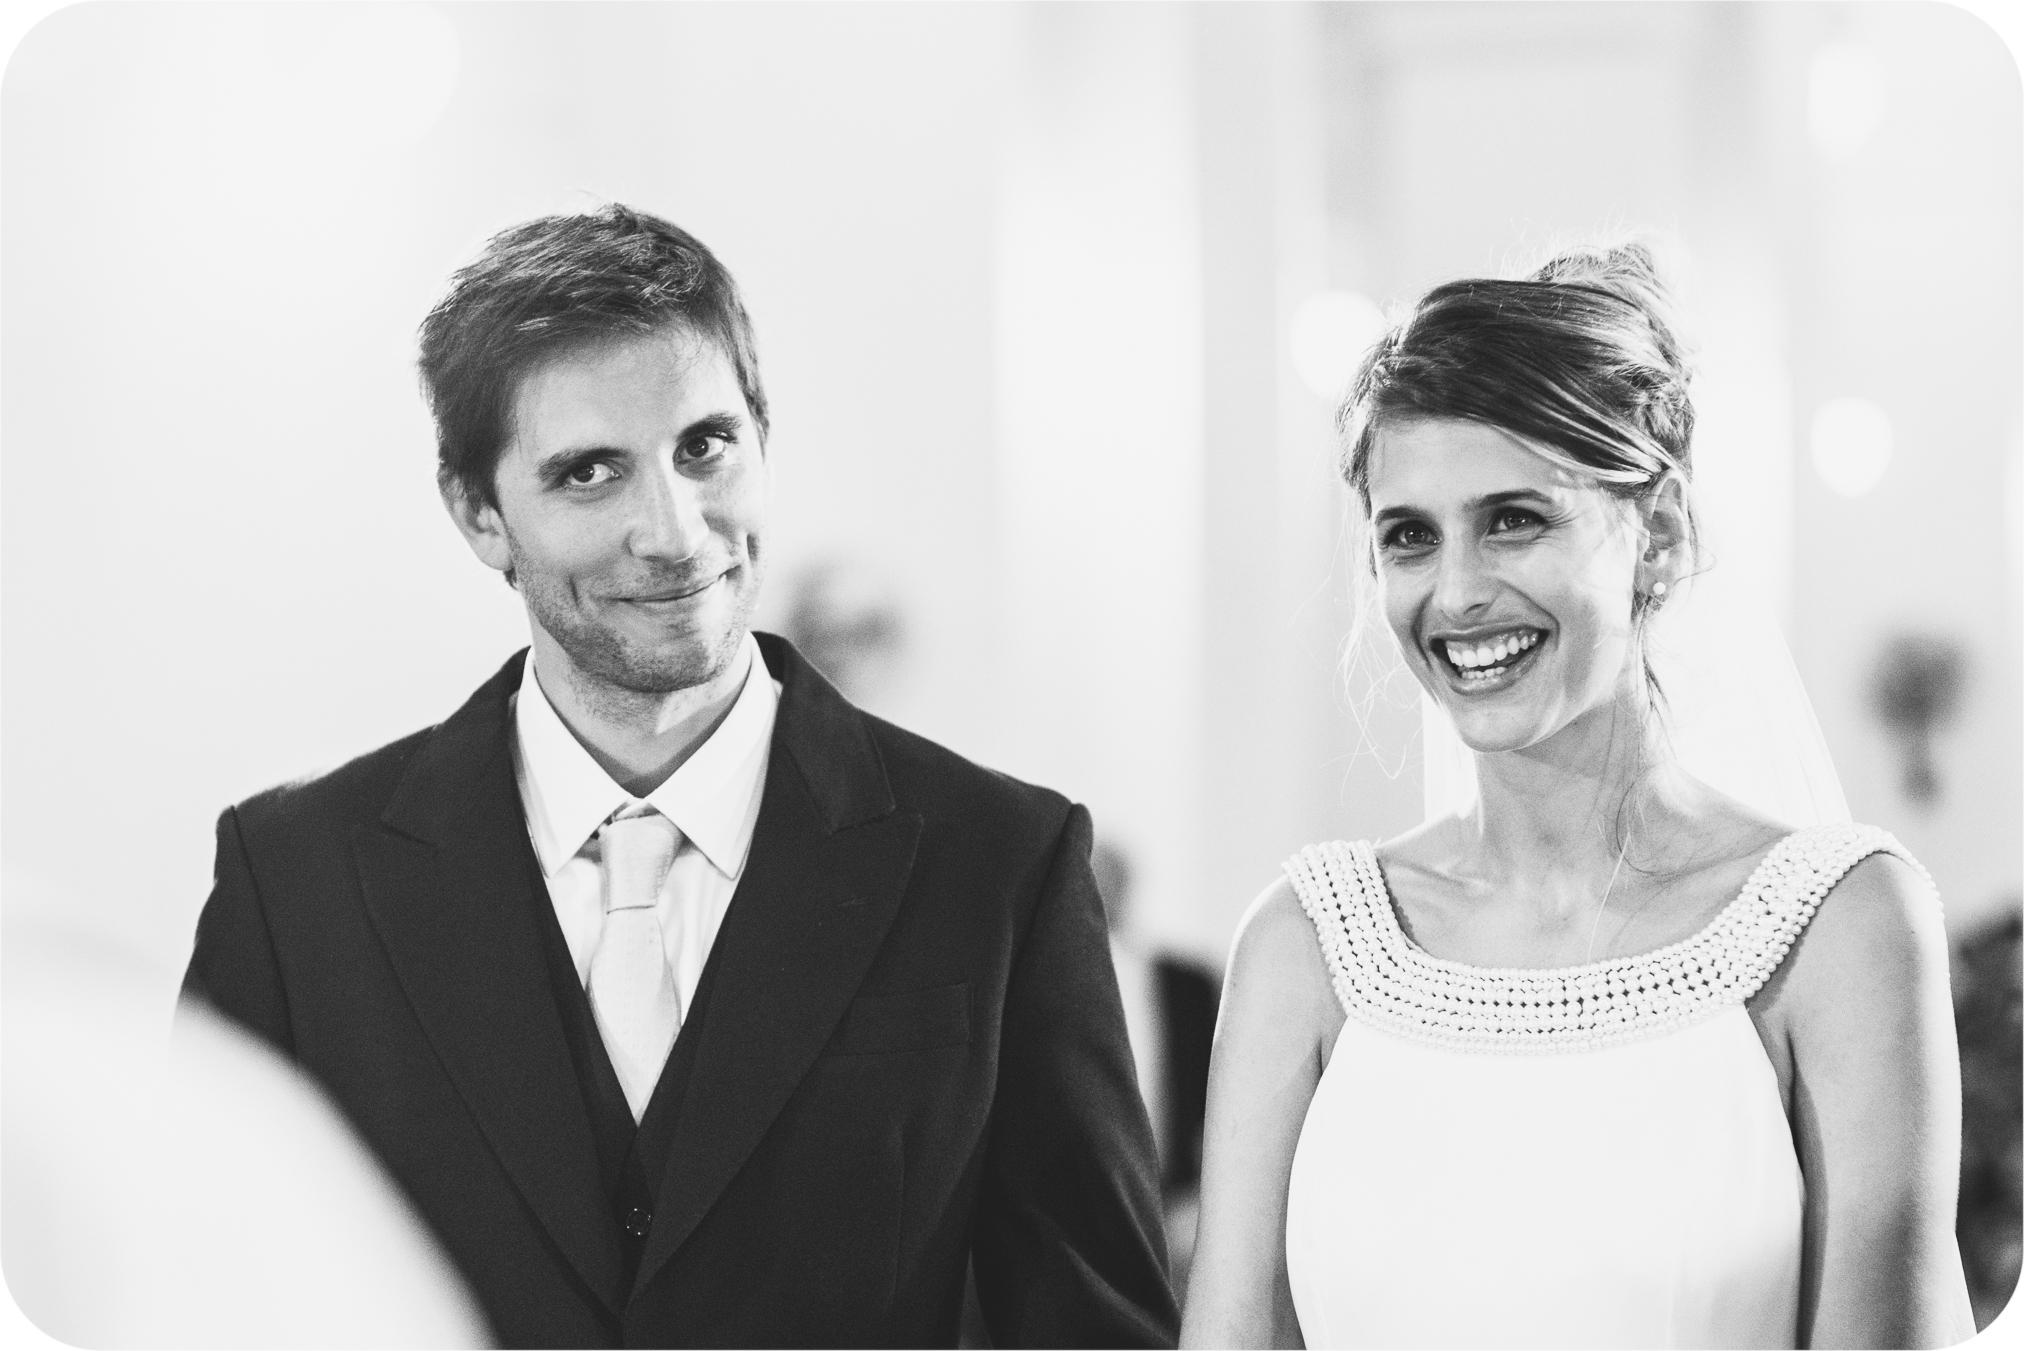 Fotos ceremonia casamiento | Maxi Oviedo